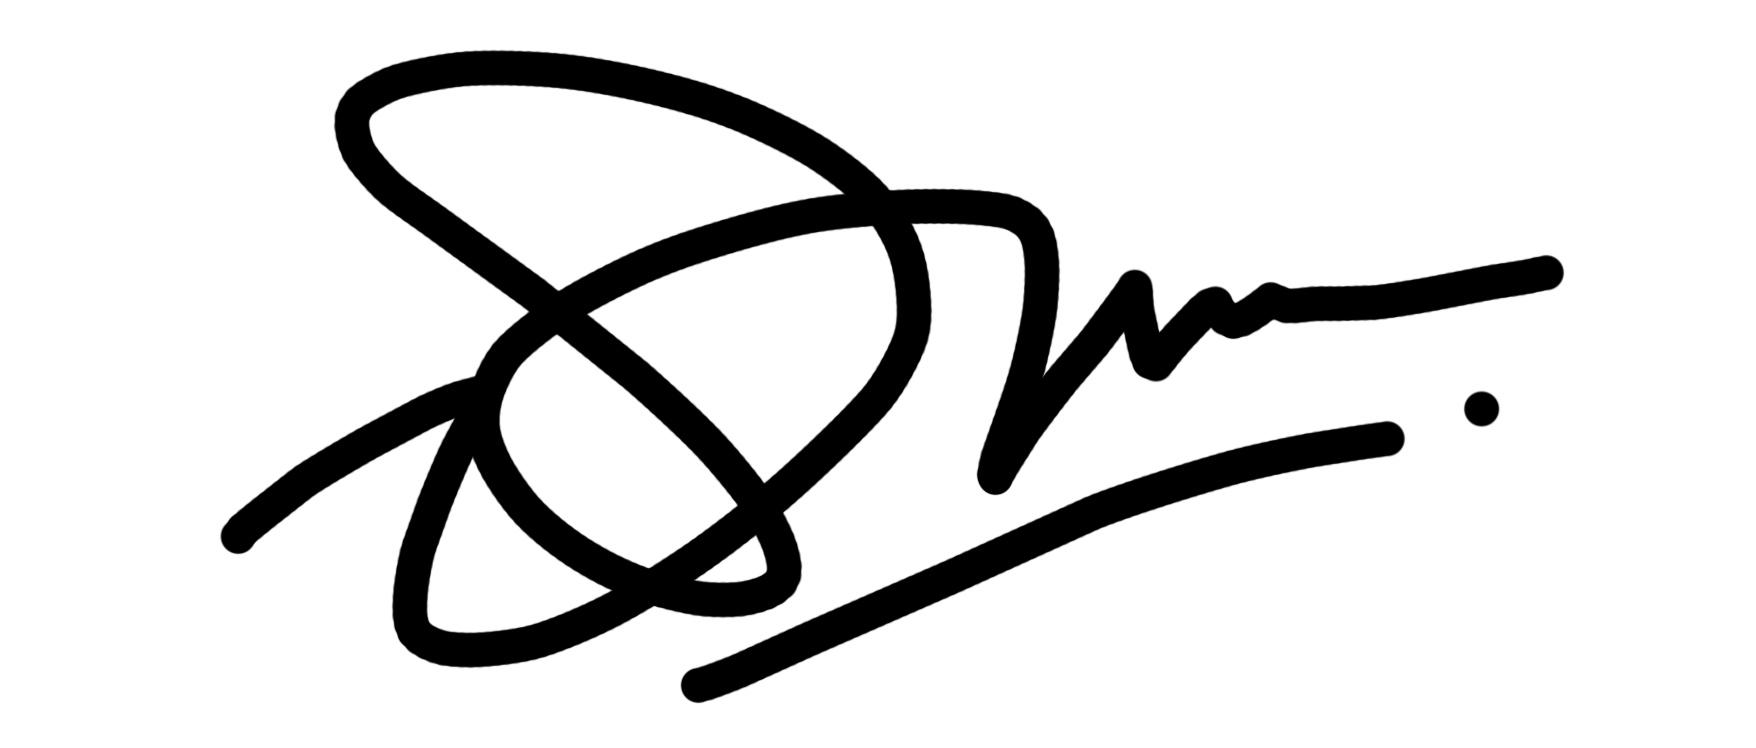 danu yudhistiro's Signature